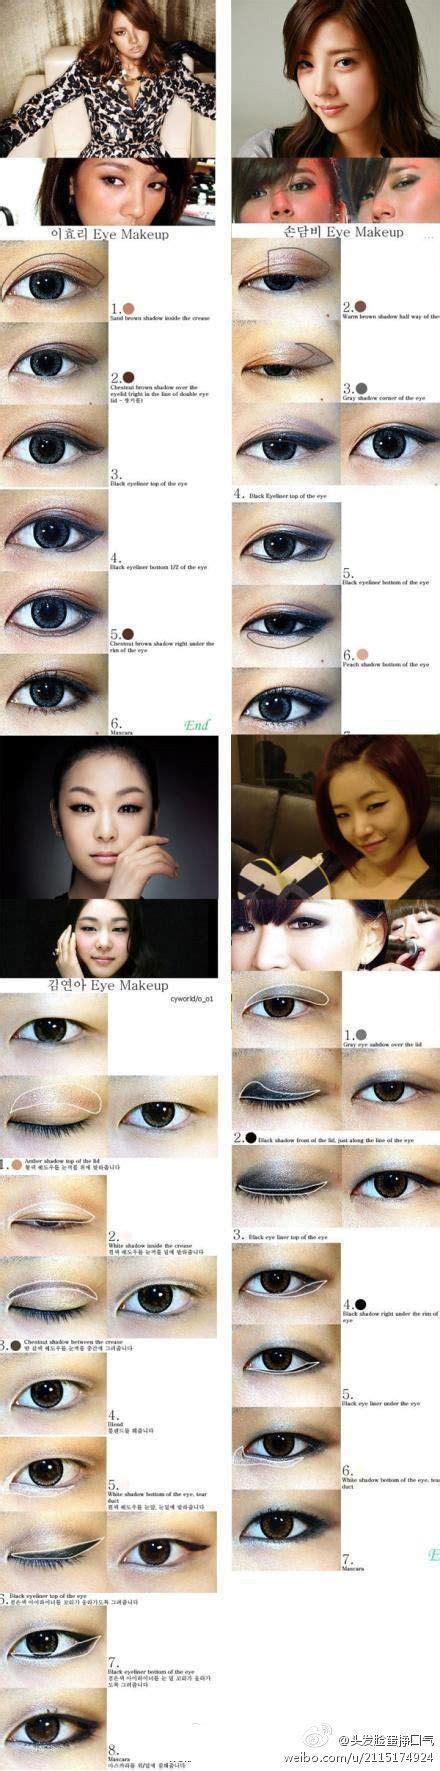 natural makeup tutorial pinterest enhanced quot natural quot look mkp hair nails such